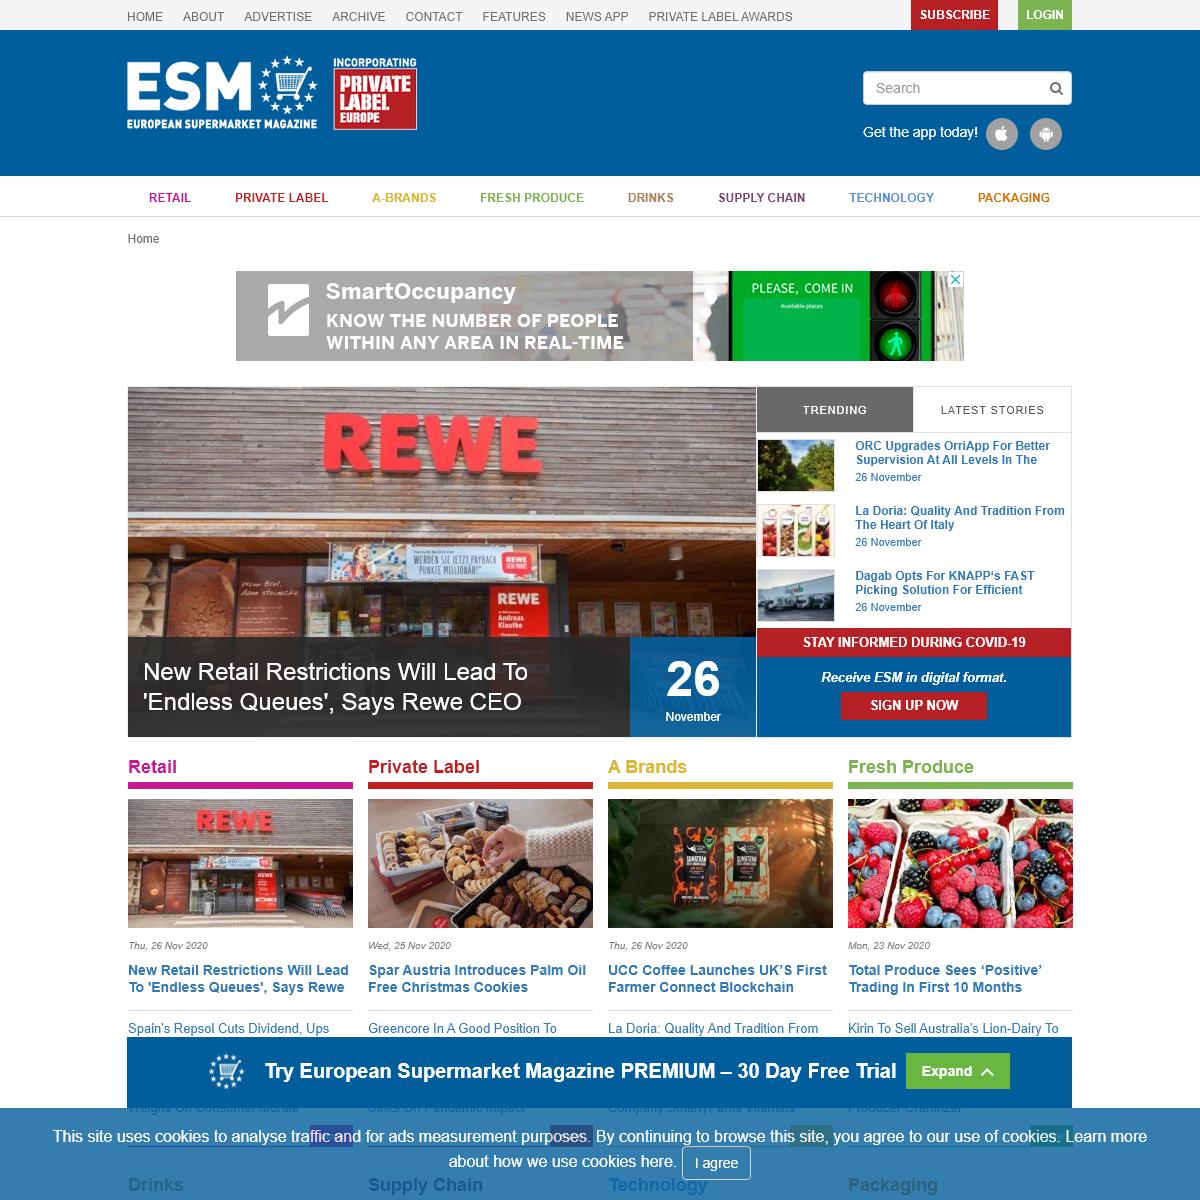 European Supermarket Magazine - ESM Magazine